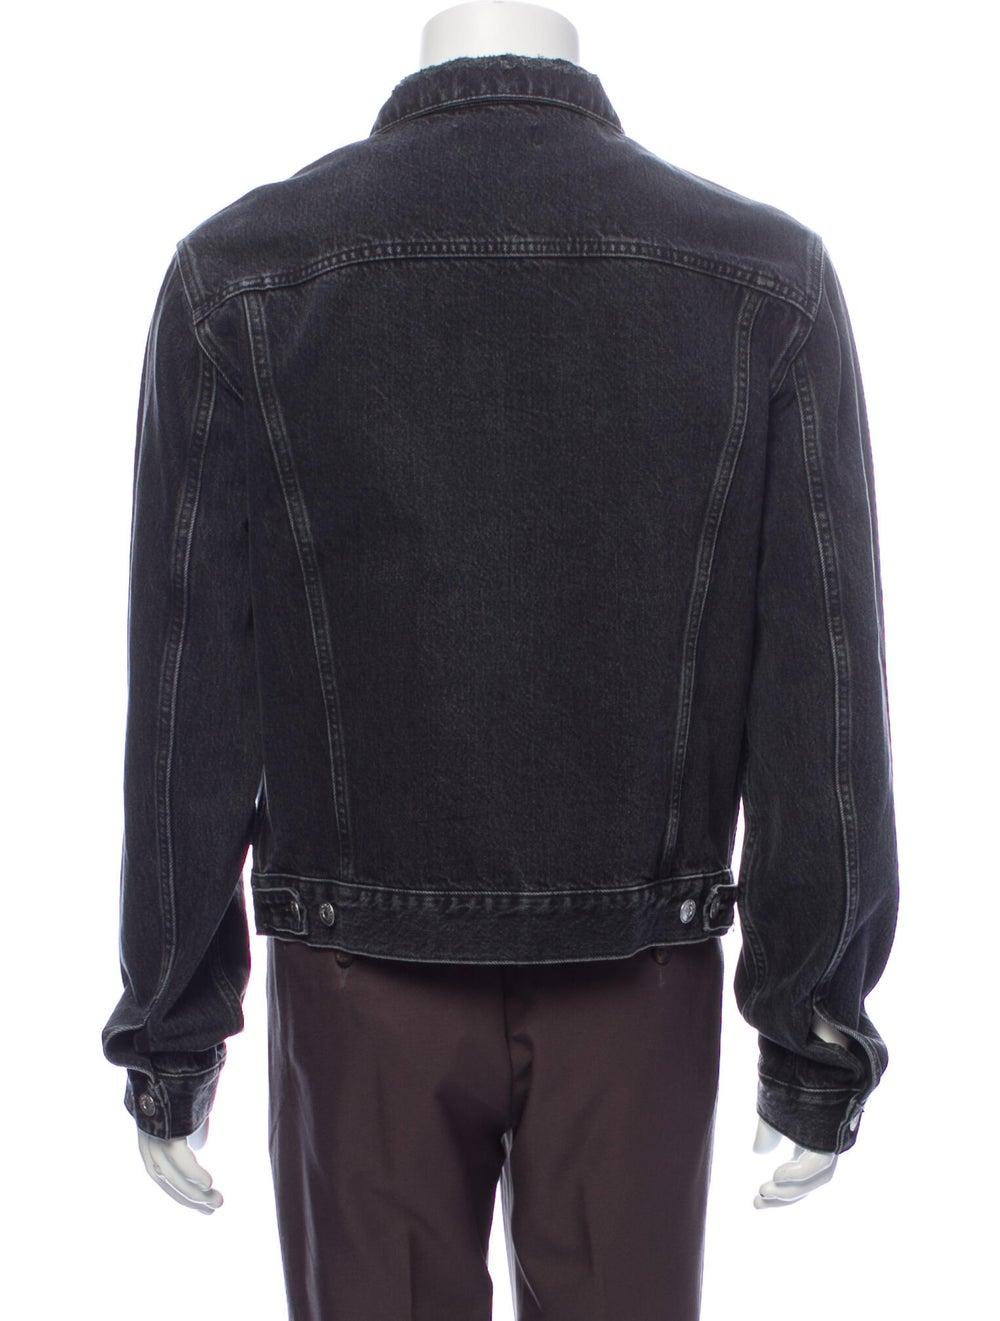 Balenciaga 2018 Denim Jacket Denim - image 3